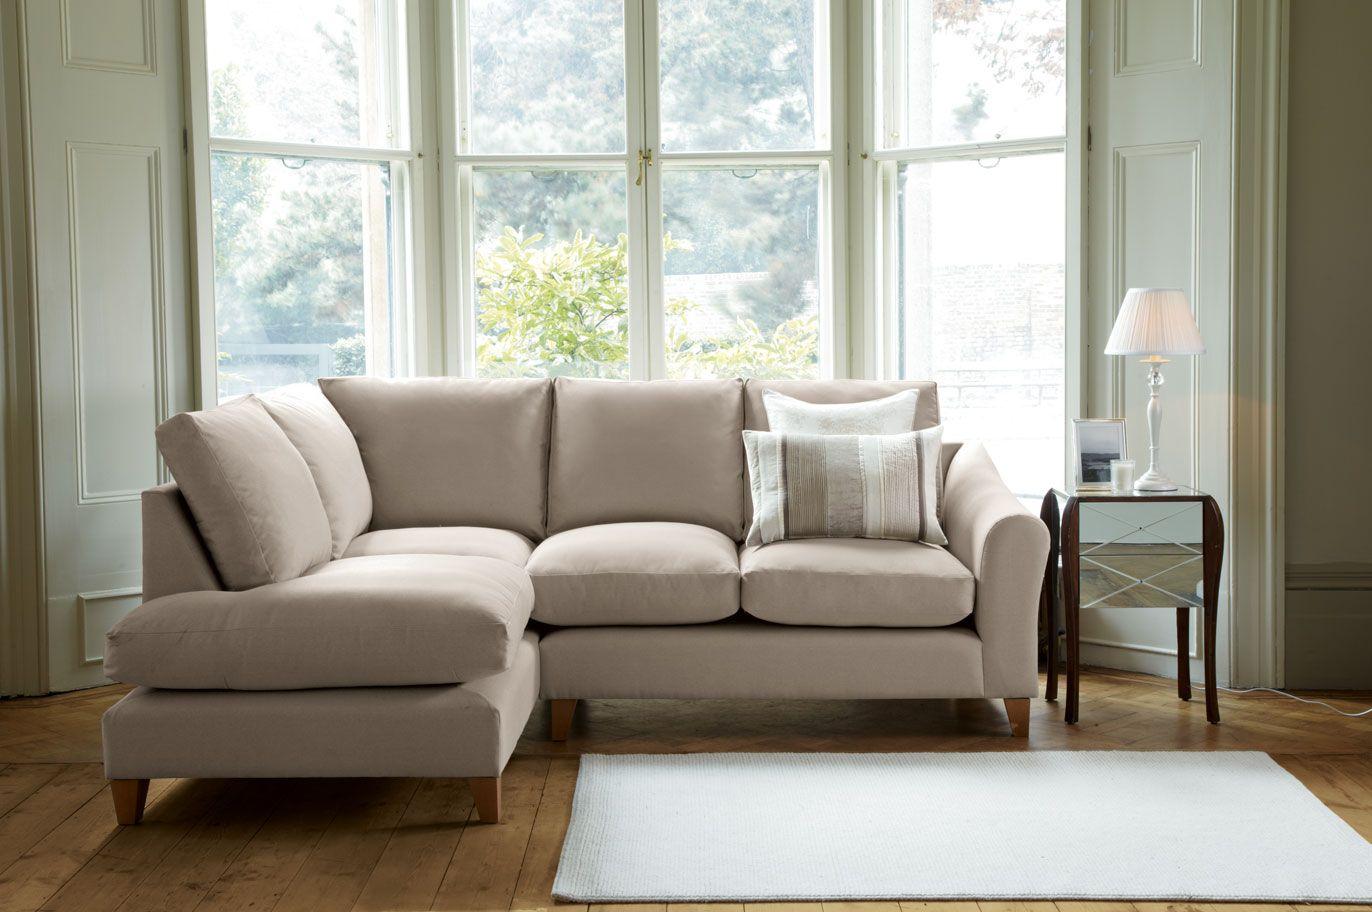 Baslow Upholstered Corner Unit Left Hand Laura Ashley